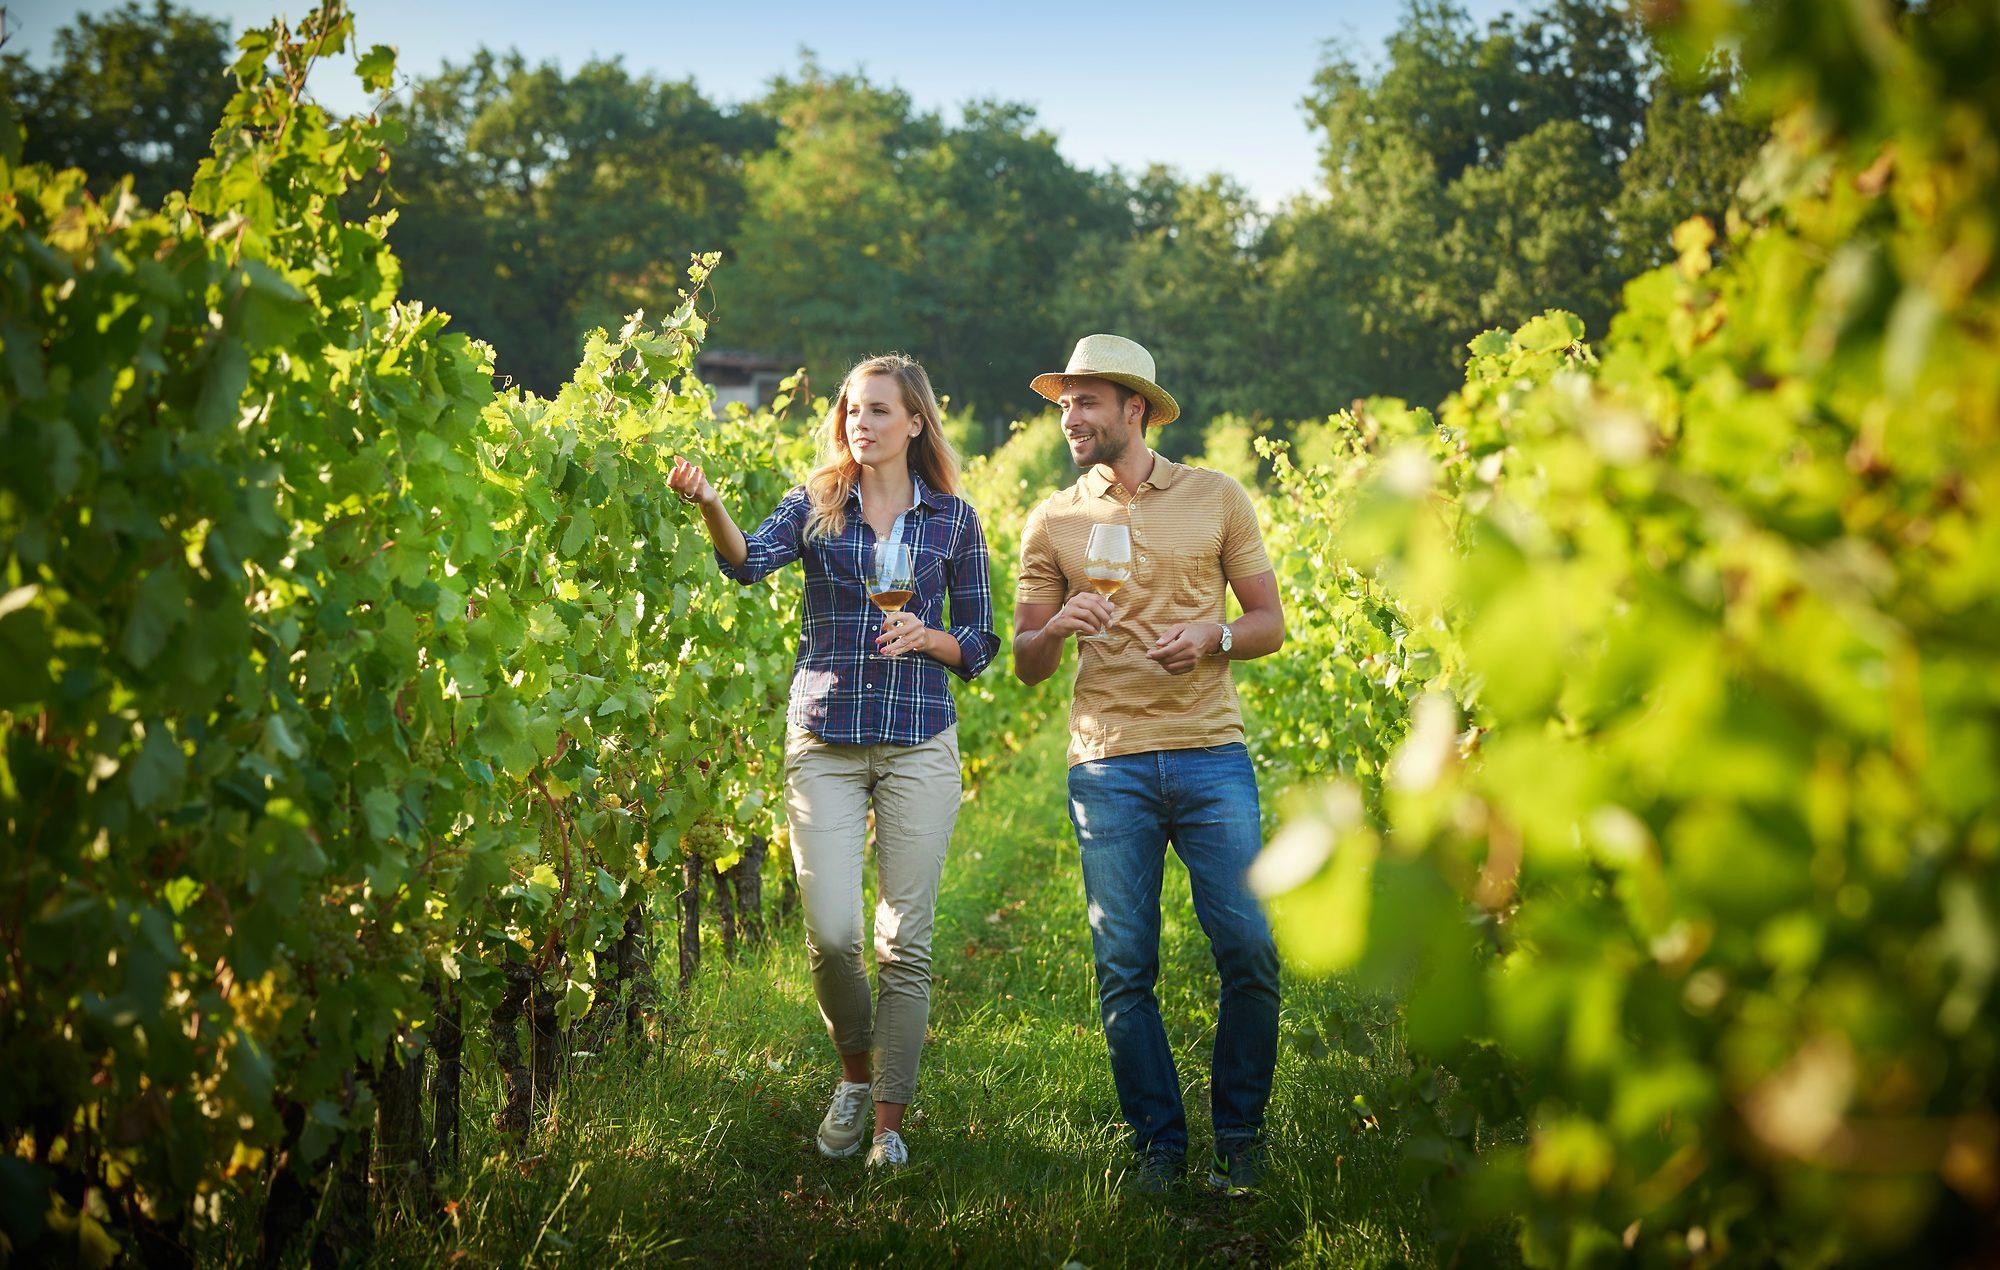 vipavski vinogradi